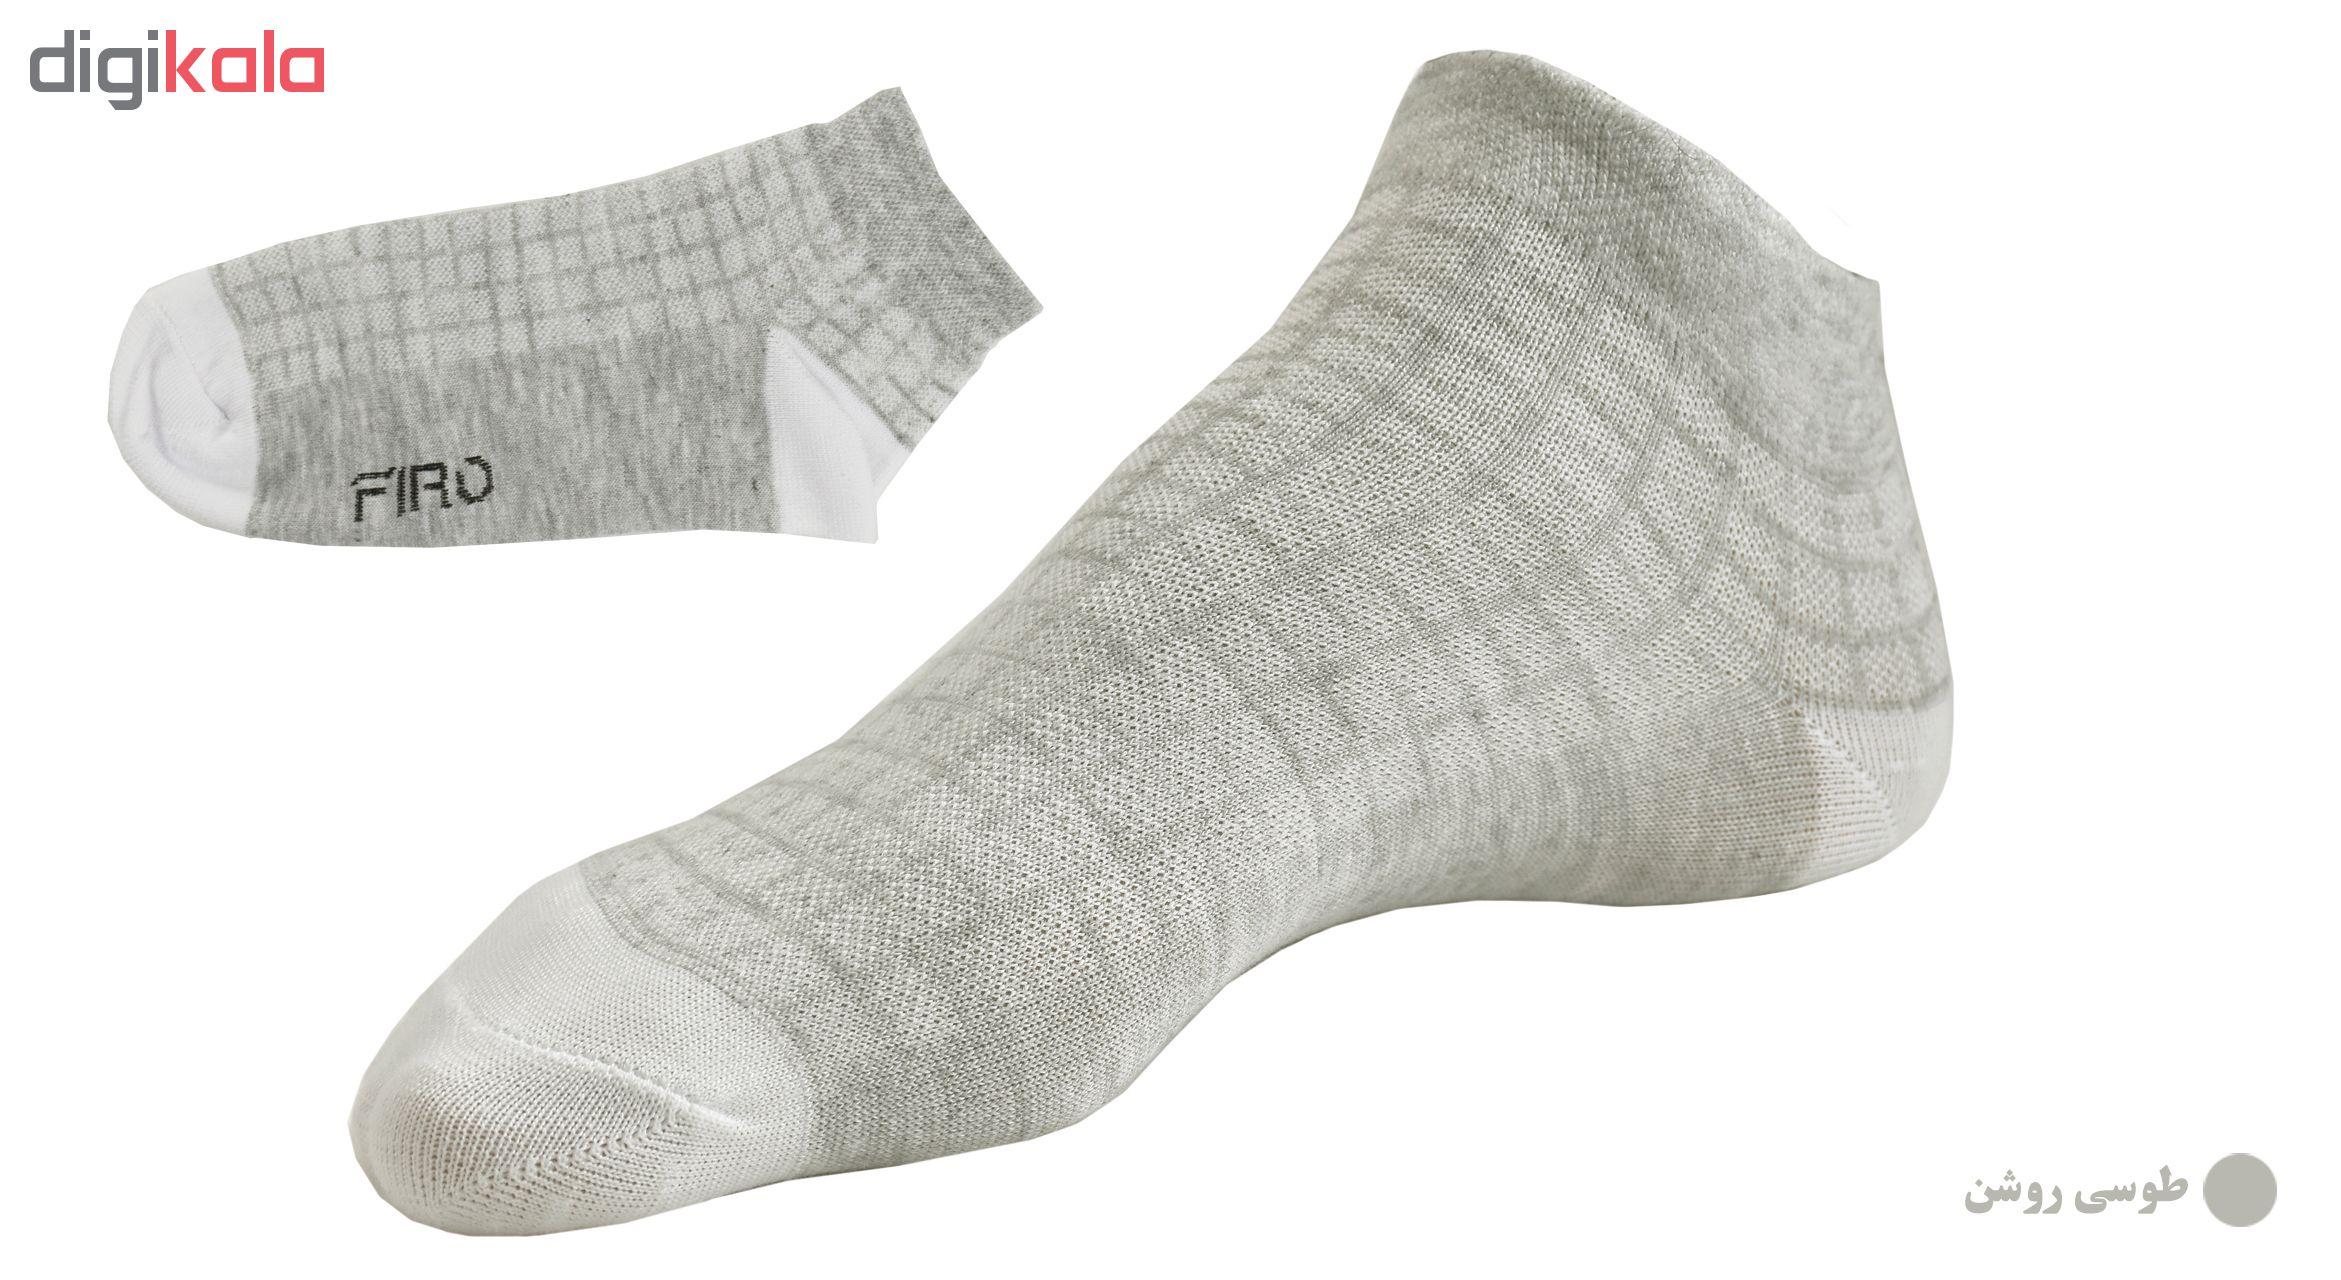 جوراب مردانه فیرو کد FT250 مجموعه 6 عددی main 1 3